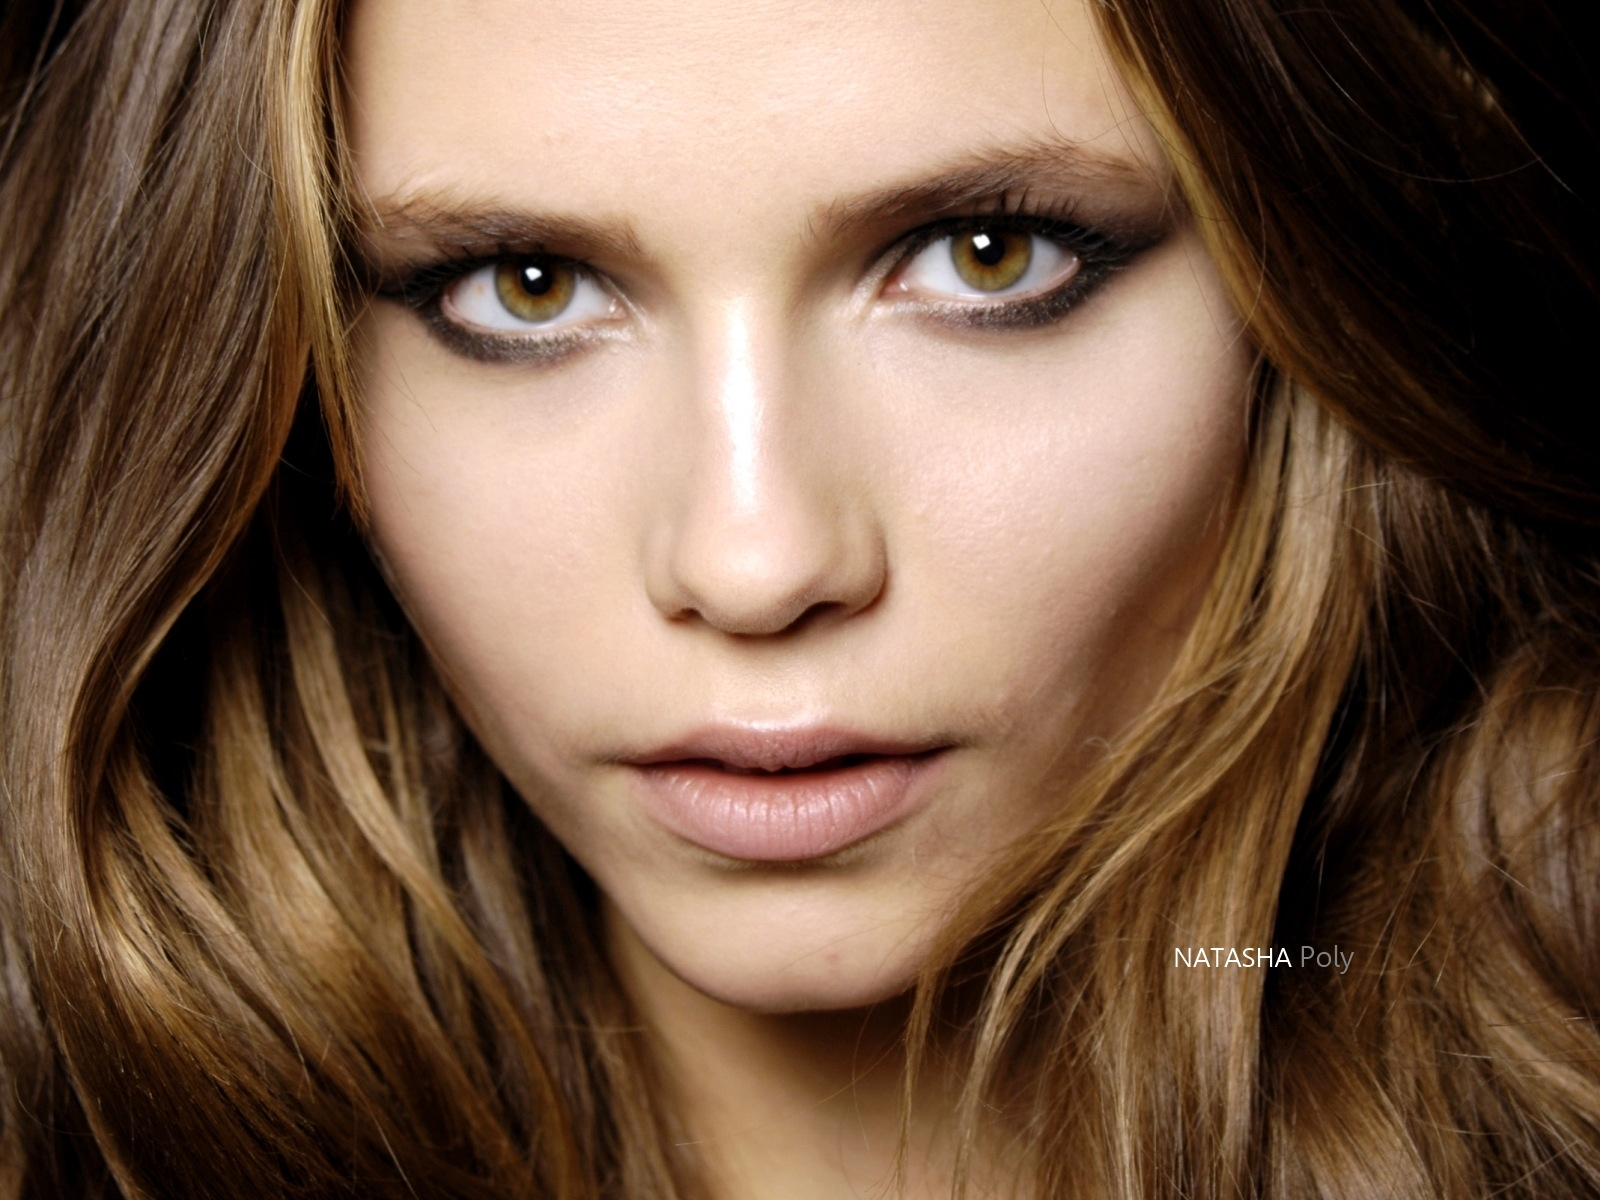 http://4.bp.blogspot.com/-h69ZkYc-eo4/T7_WGsKiDKI/AAAAAAAAL9g/8CzeIeTvxp0/s1600/Natasha_Poly_Fashion_model_wallpaper_1600x1200.jpg